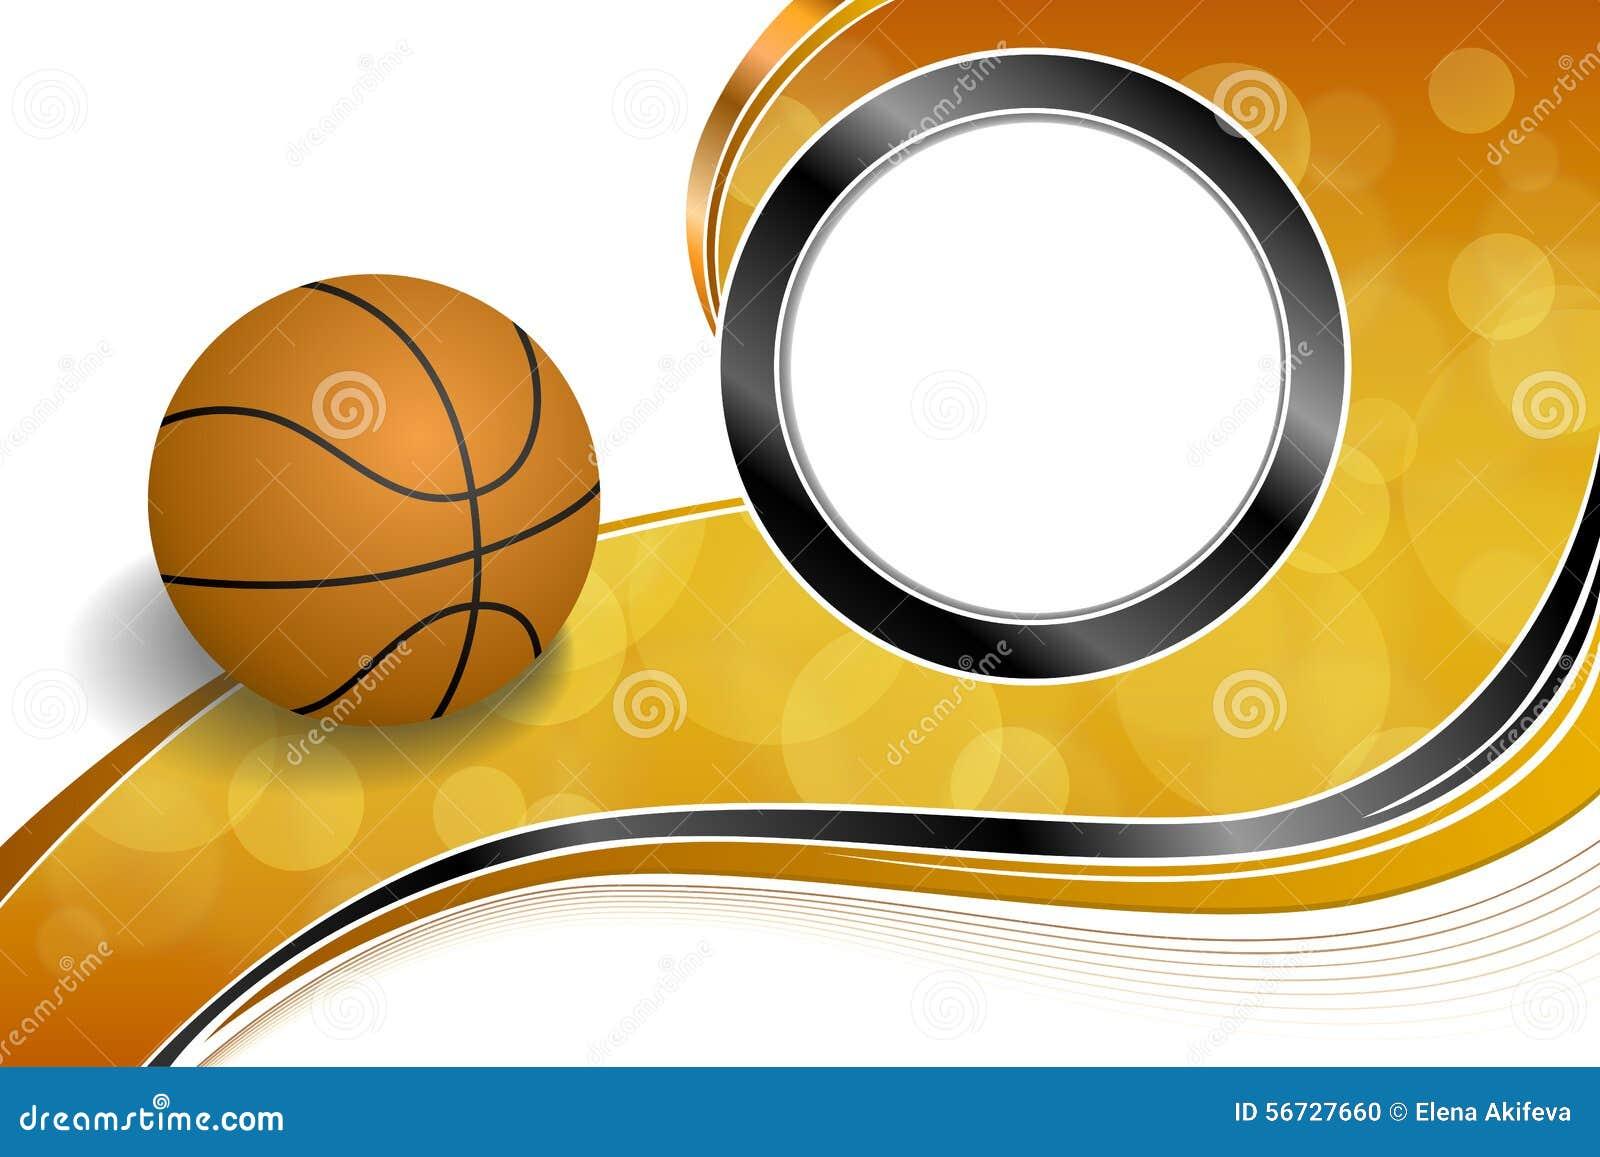 Color Sport Background Football Basketball Hockey Stock: Background Abstract Orange Black Sport Basketball Ball